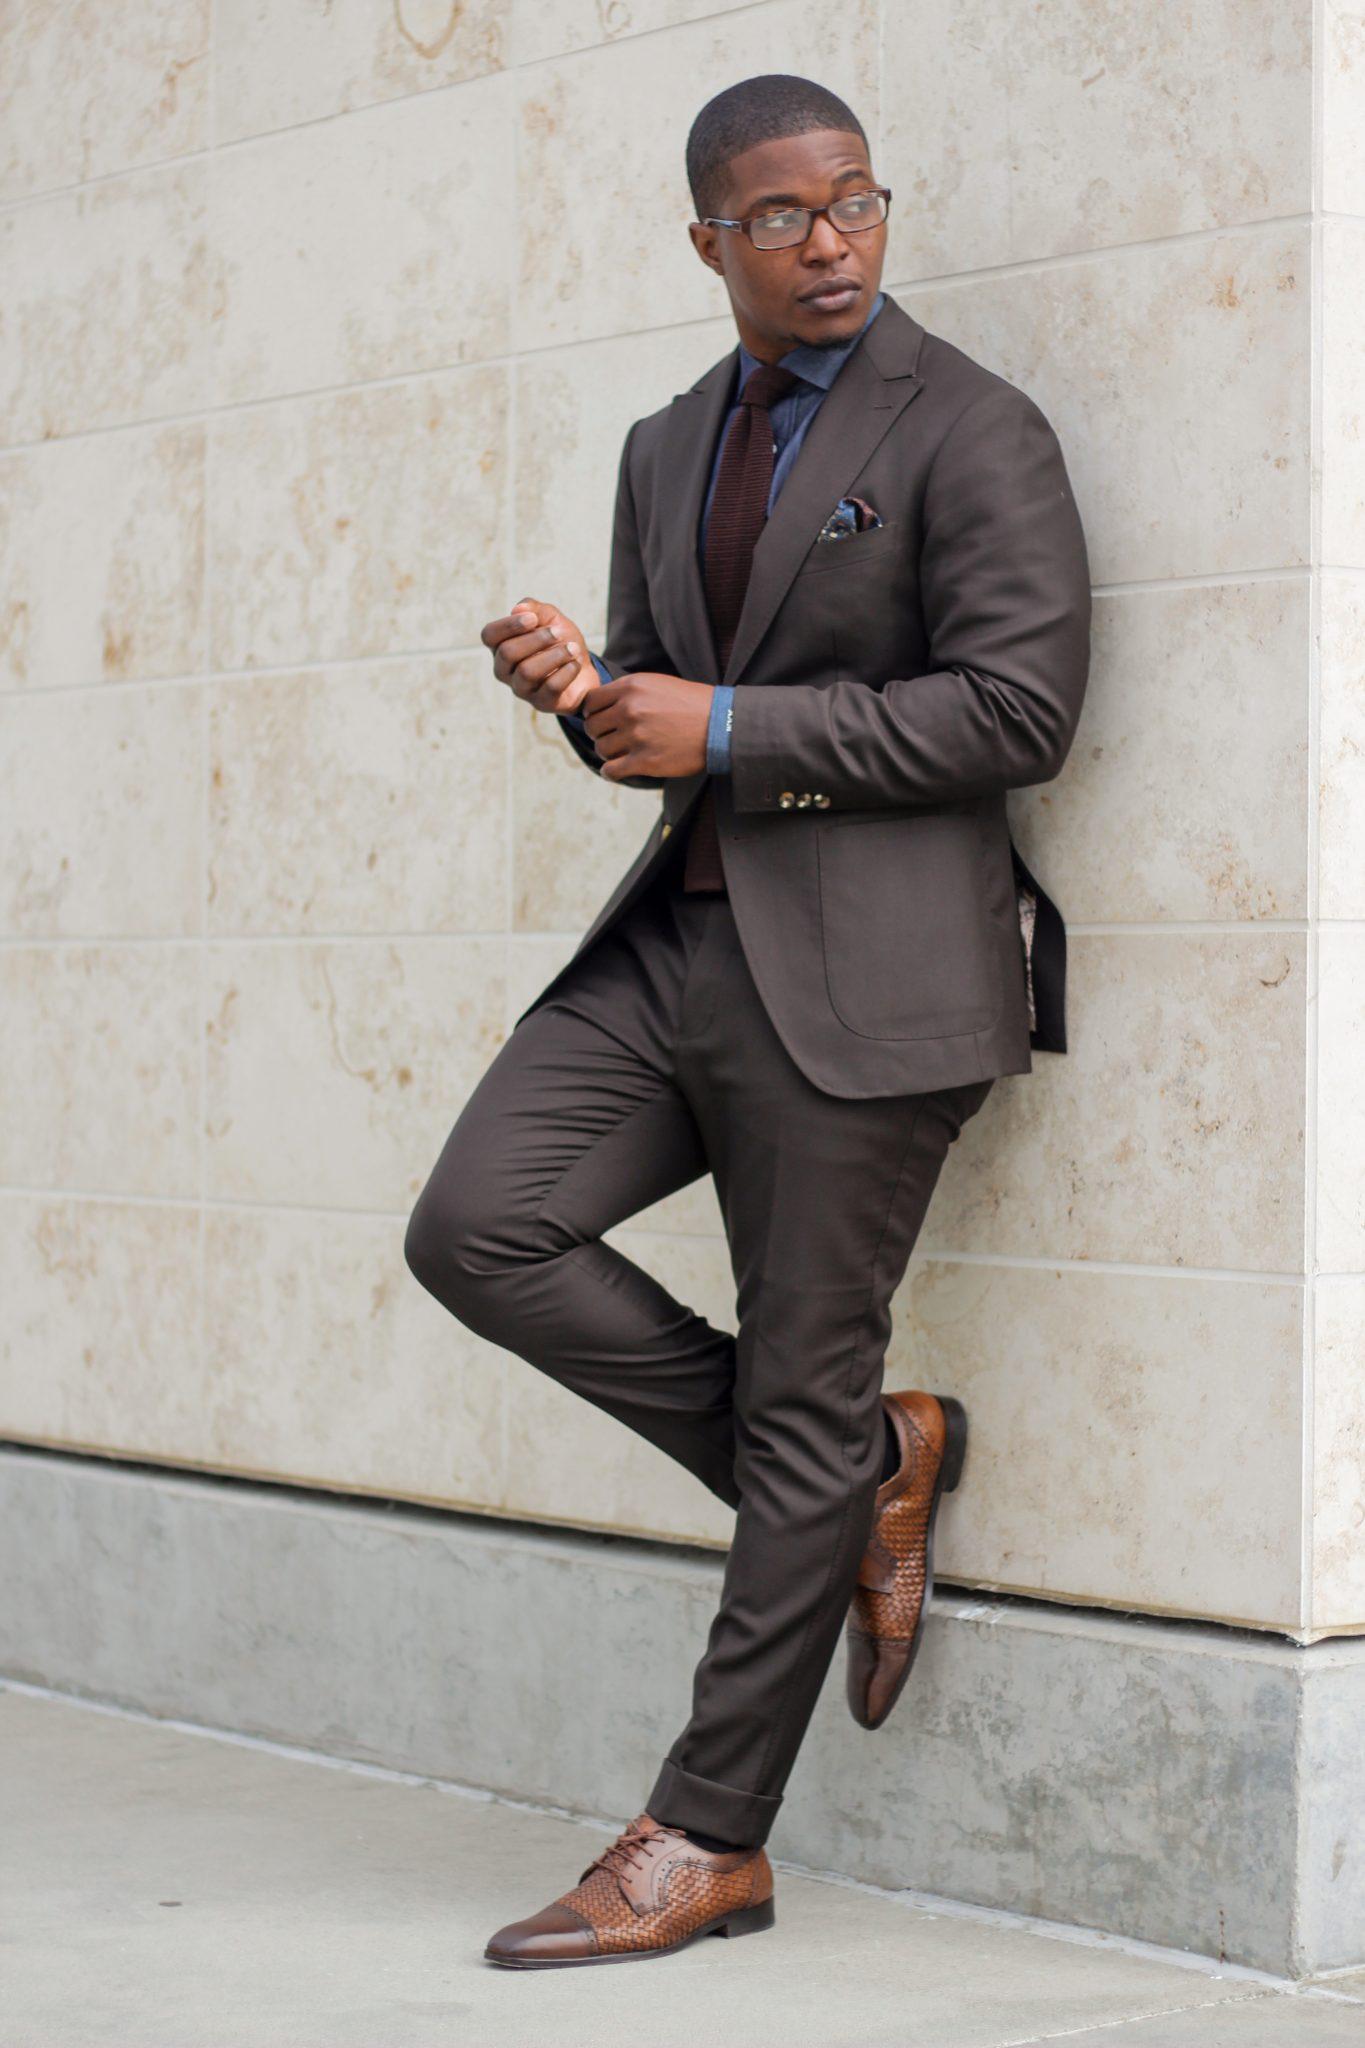 Brown & Blue Suit Combinations - The Dapper Advisor